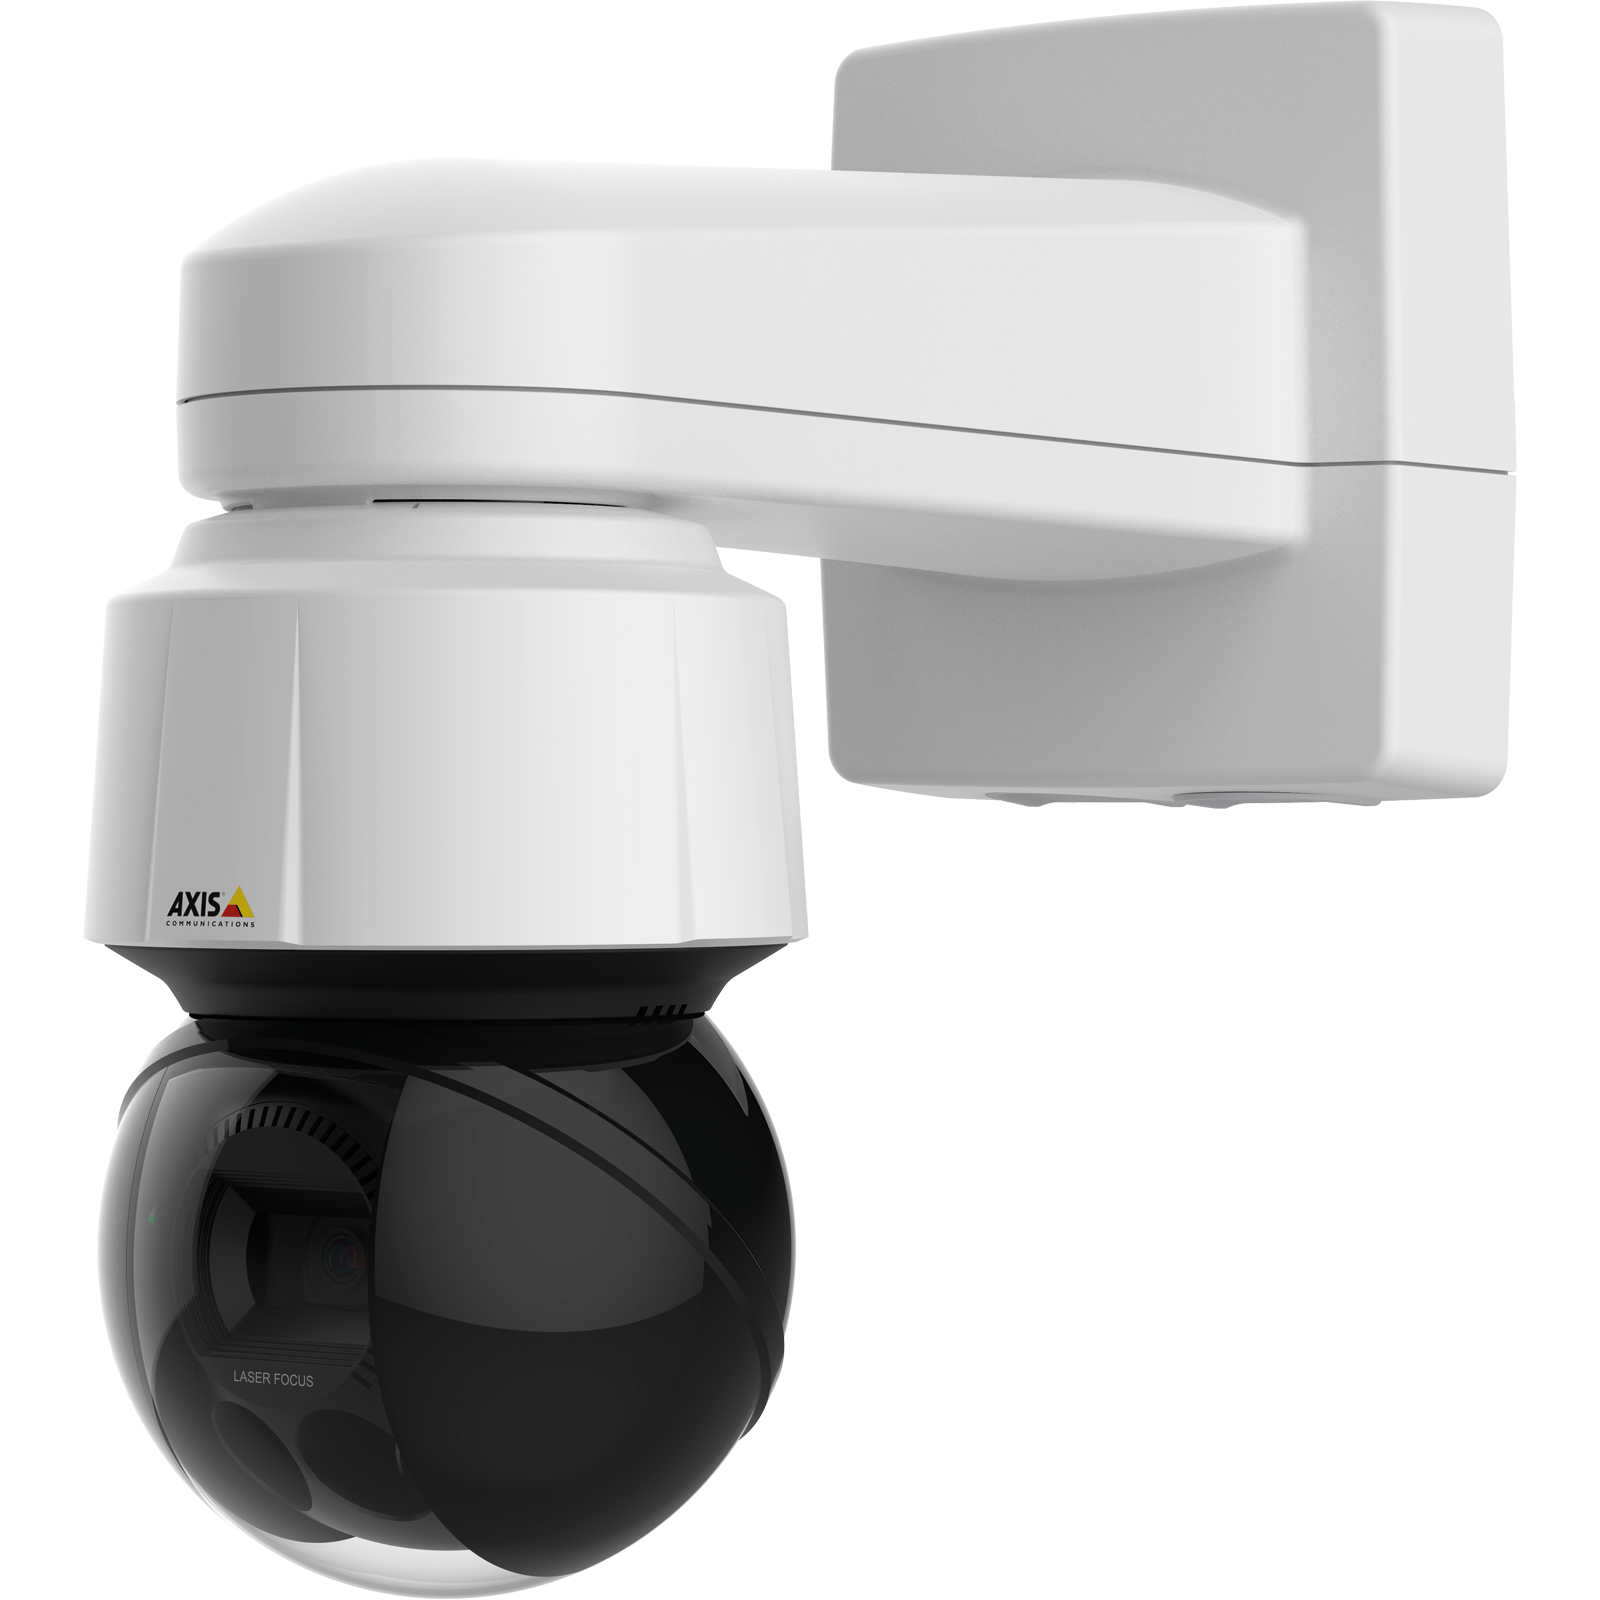 AXIS Q6155-E PTZ-Netzwerk-Kamera